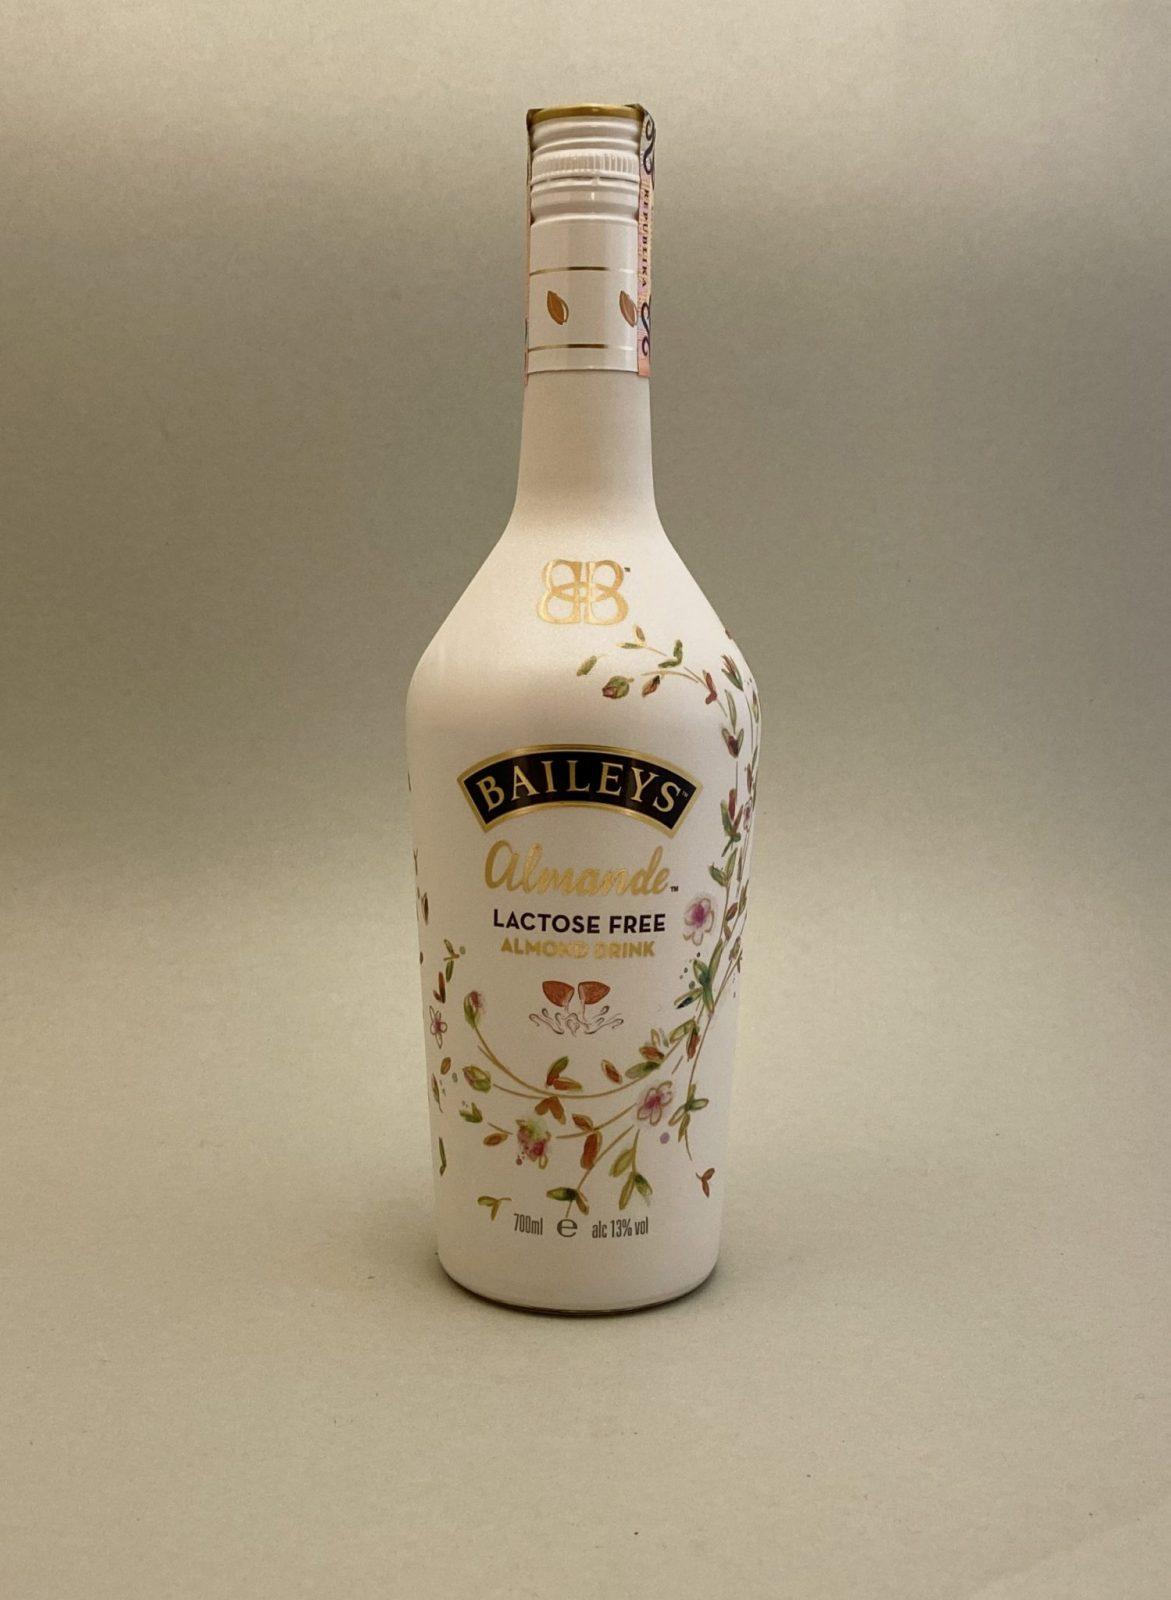 Baileys Almande 13%, Bottleshop Sunny wines slnecnice mesto, petrzalka, likér, rozvoz alkoholu, eshop